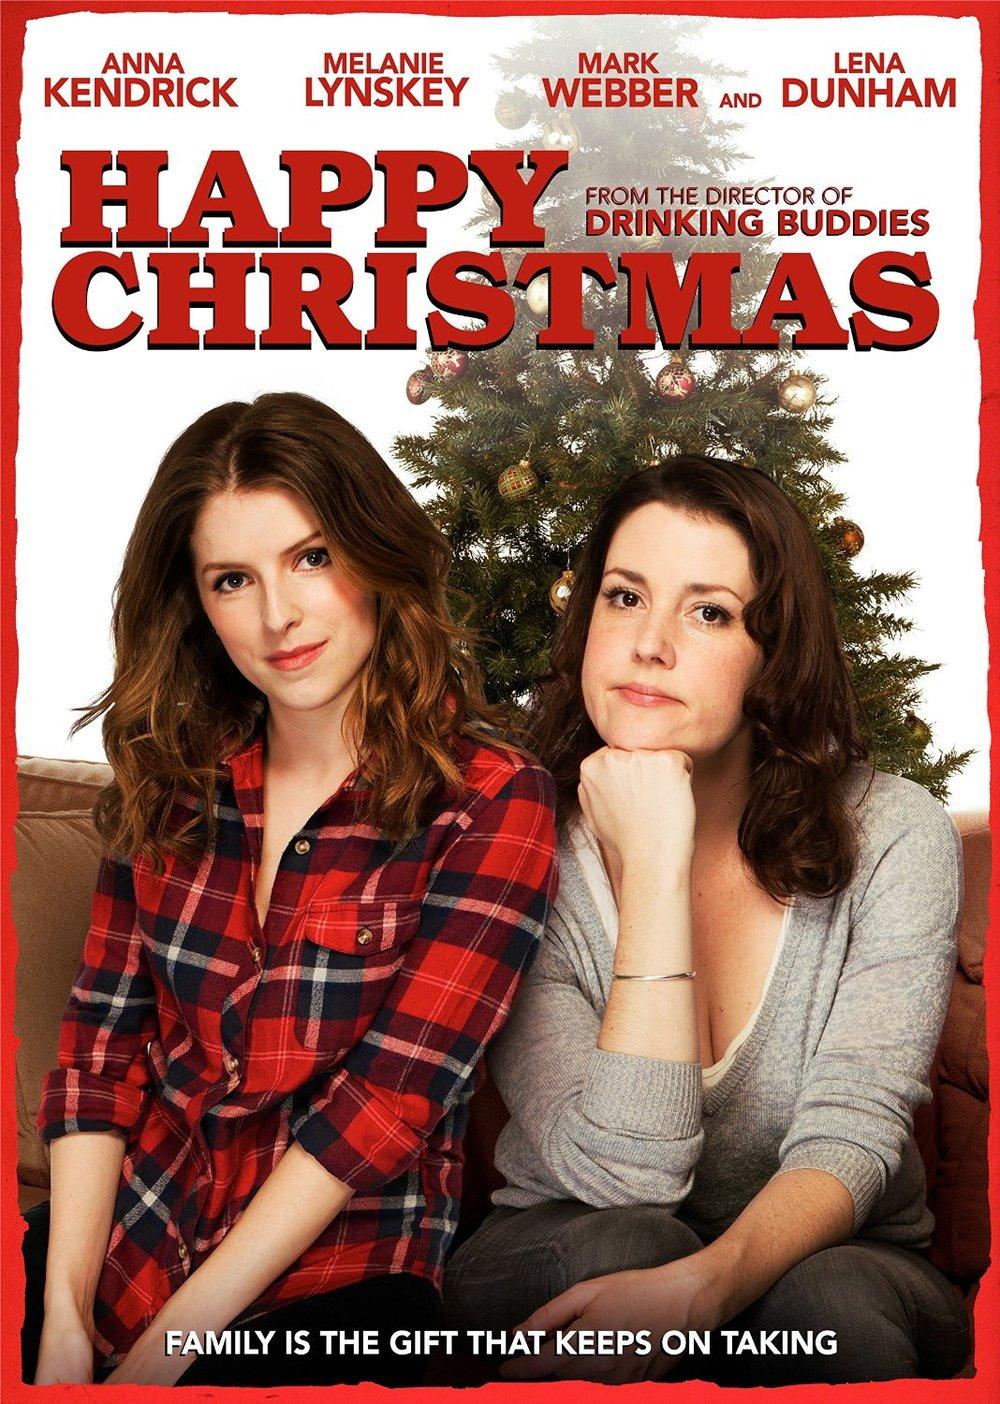 happy-christmas-movie-poster-mi8bieooq.jpg